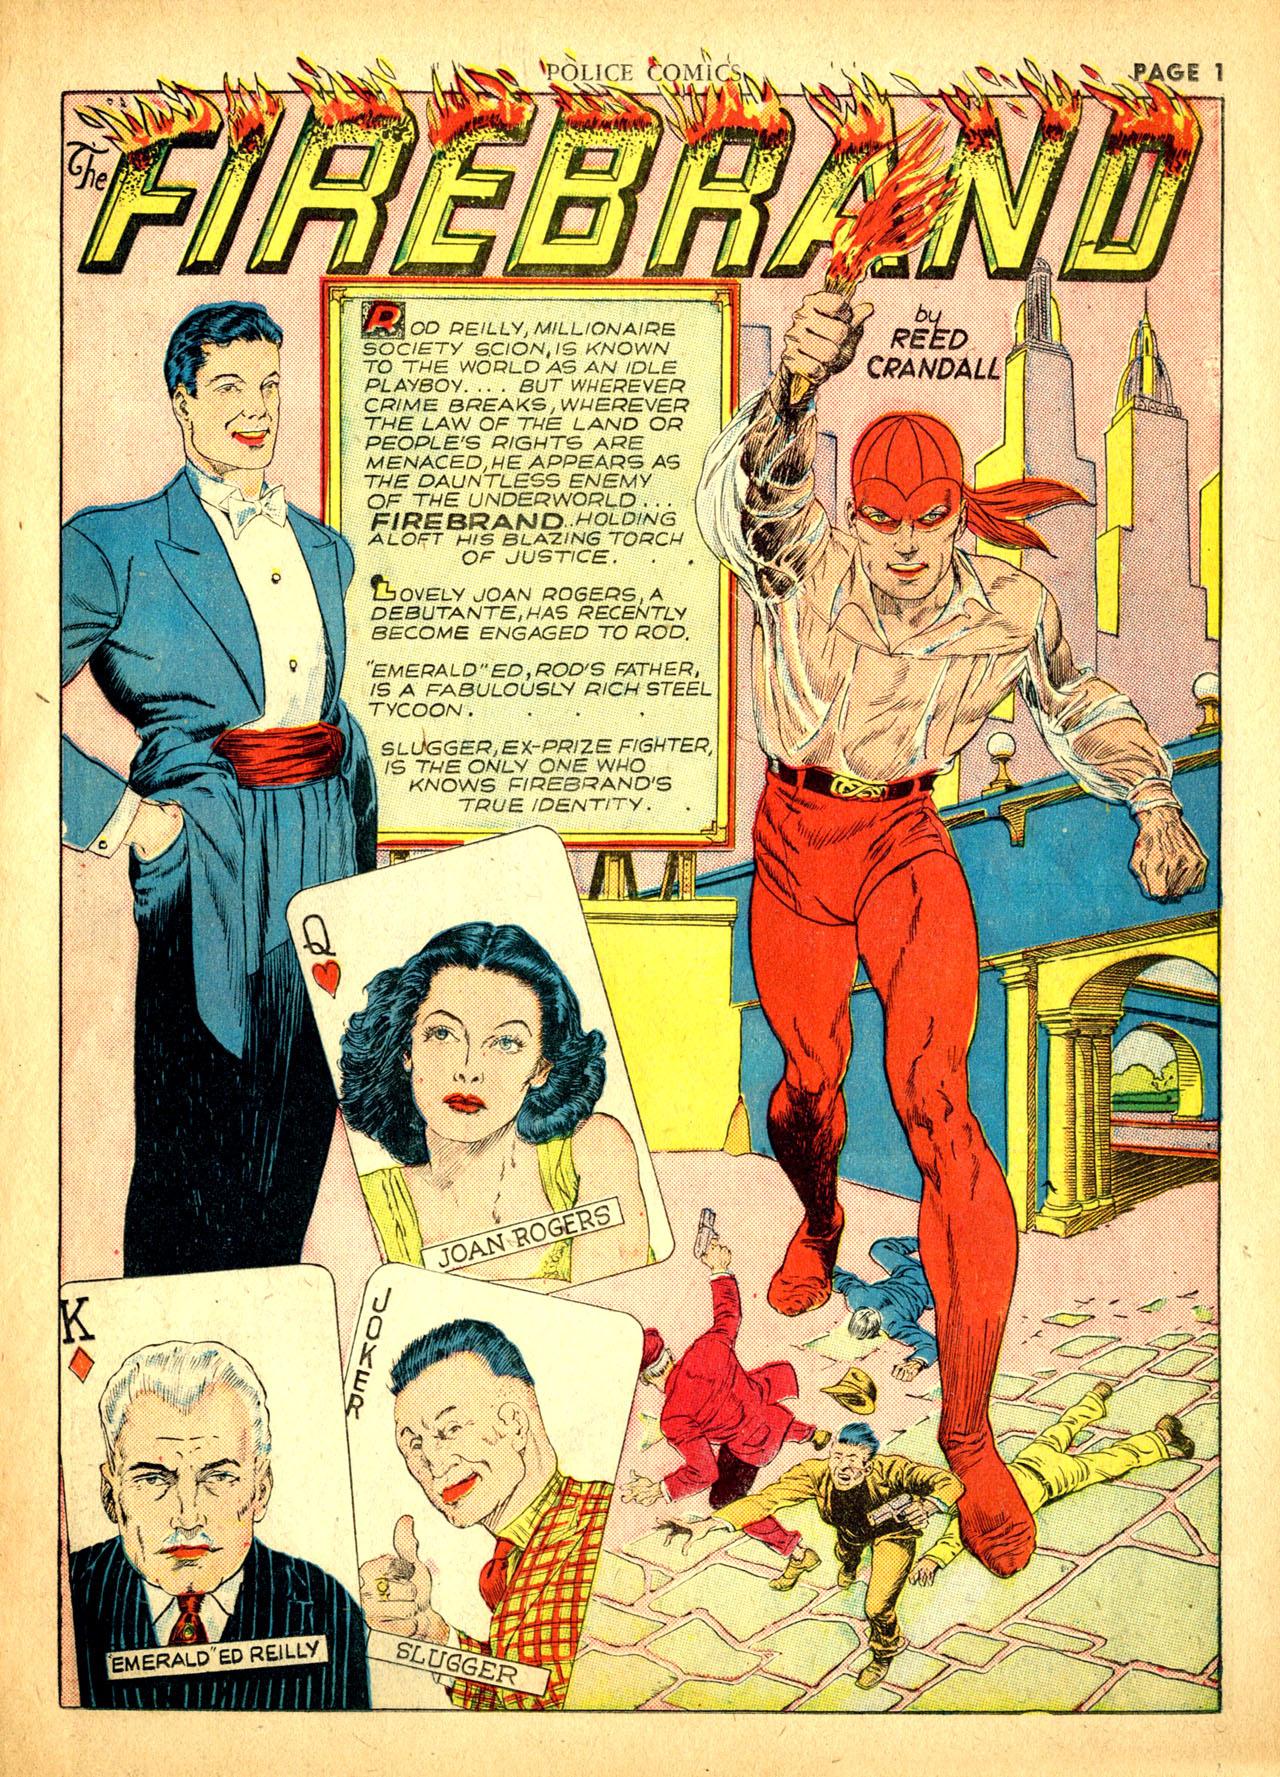 Firebrand-DC-Quality-Comics-Golden-Age.jpg